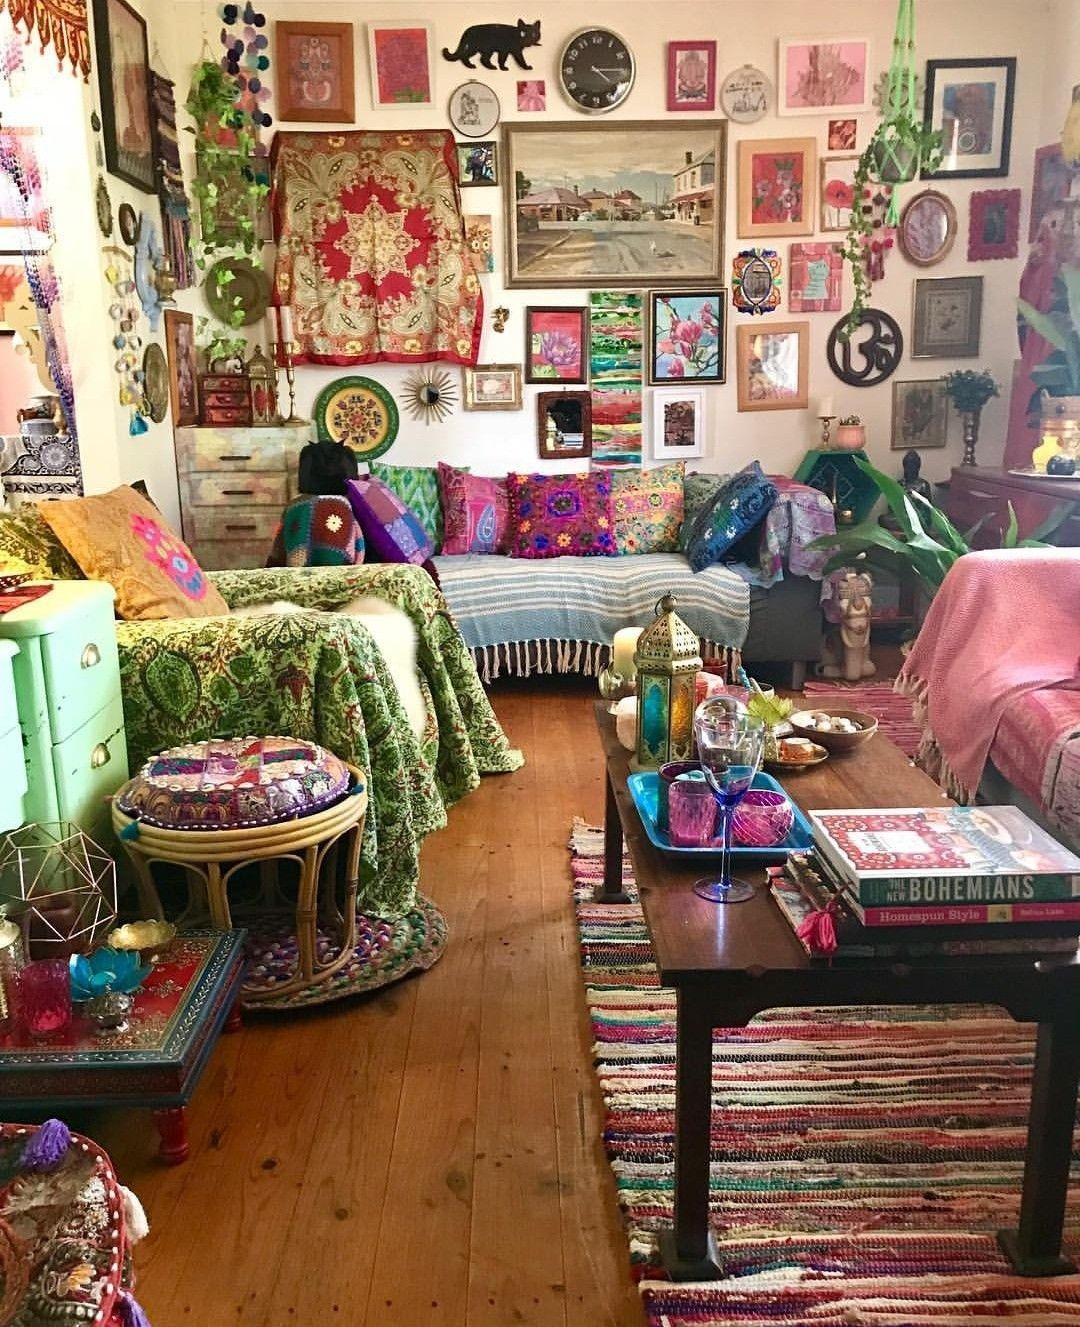 Pin By Eli Elvis Dadema On Boho Decor Room Ideas Bedroom Bohemian Living Room Decor Aesthetic Room Decor